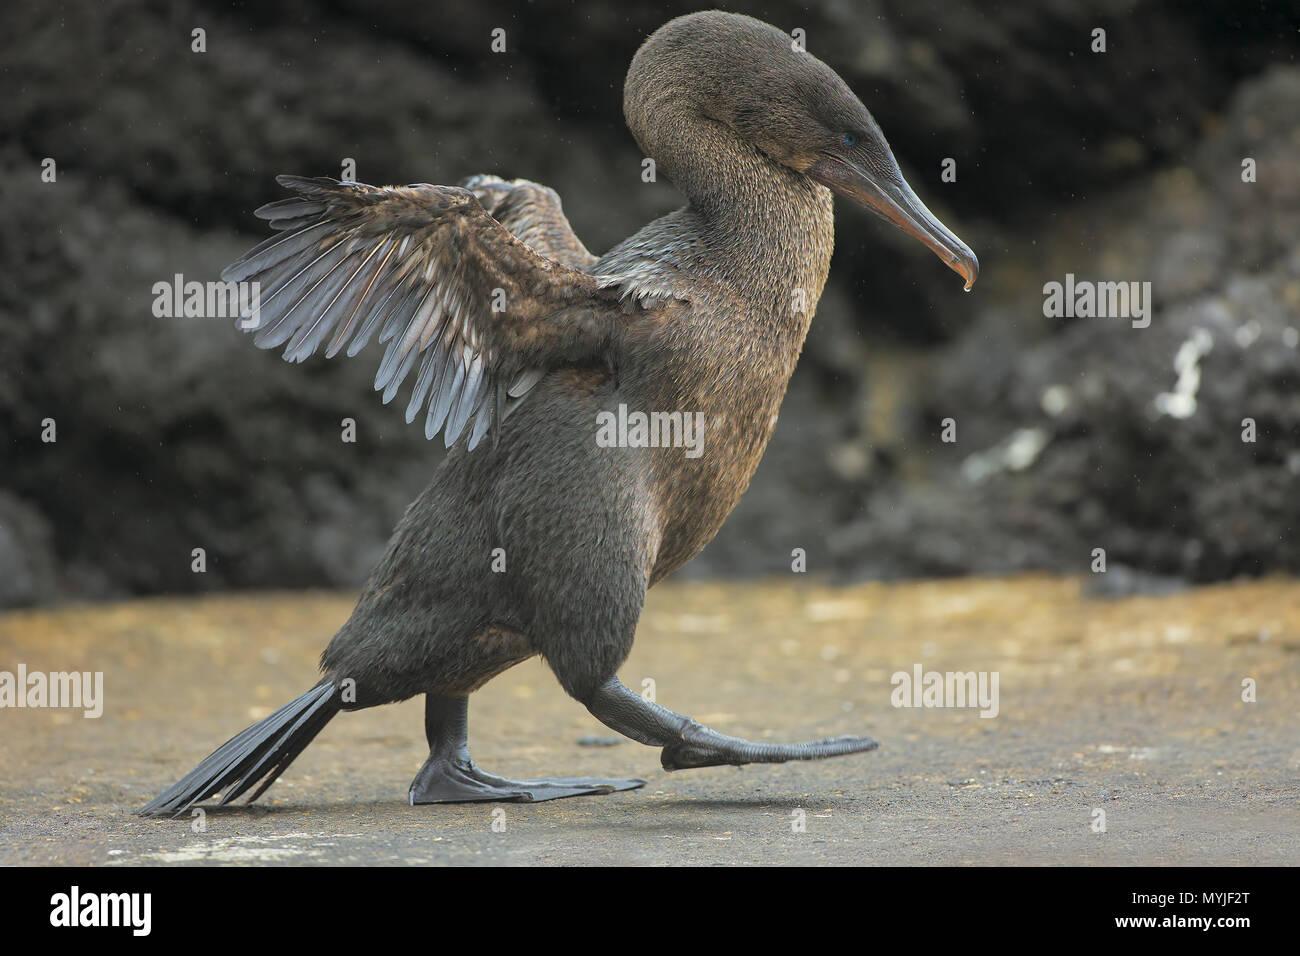 Flightless Cormorant - Stock Image